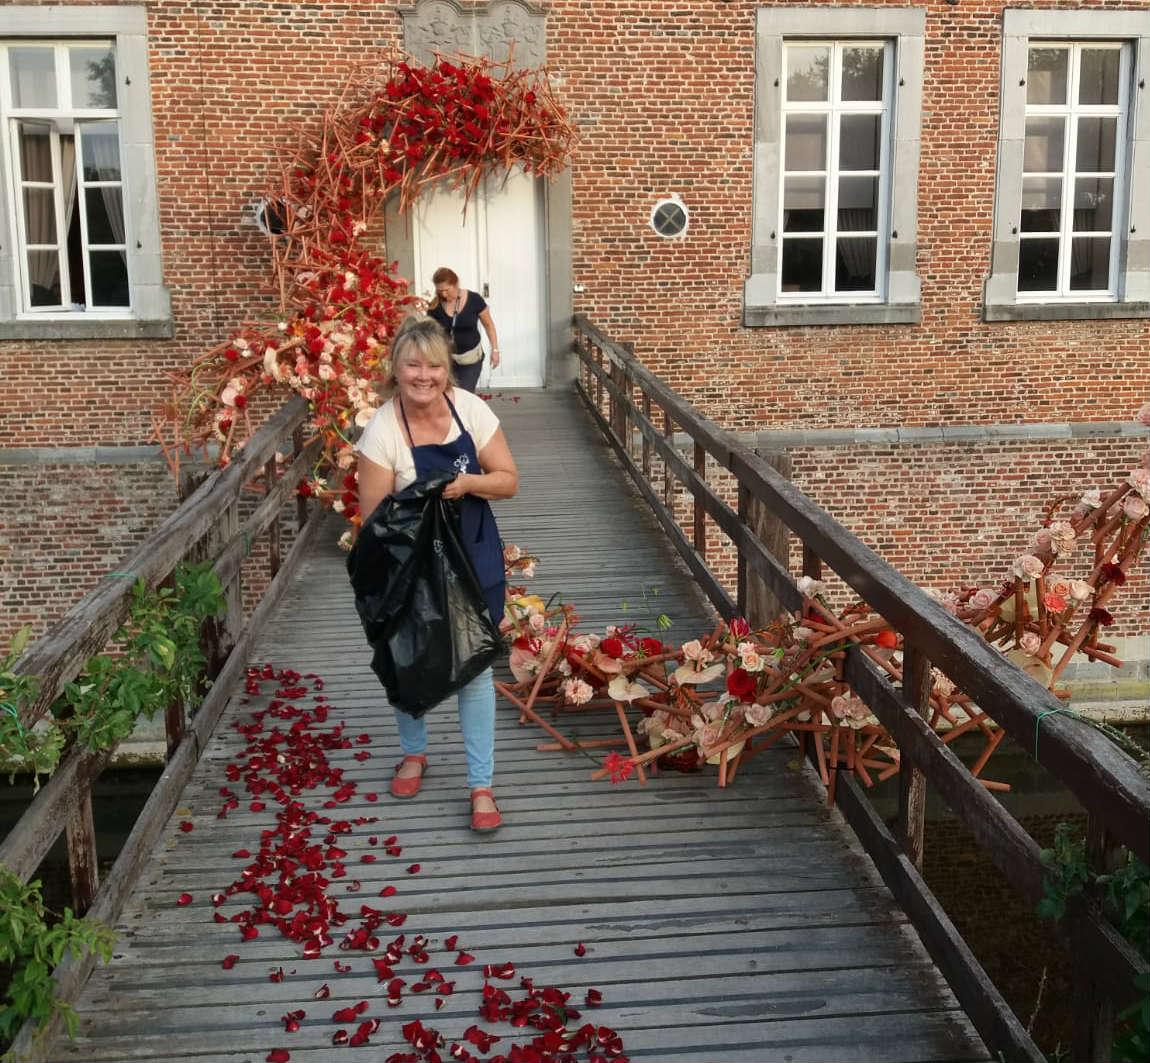 Lana bates fleuramour alden biesen porta nova roses red naomi adding flowers